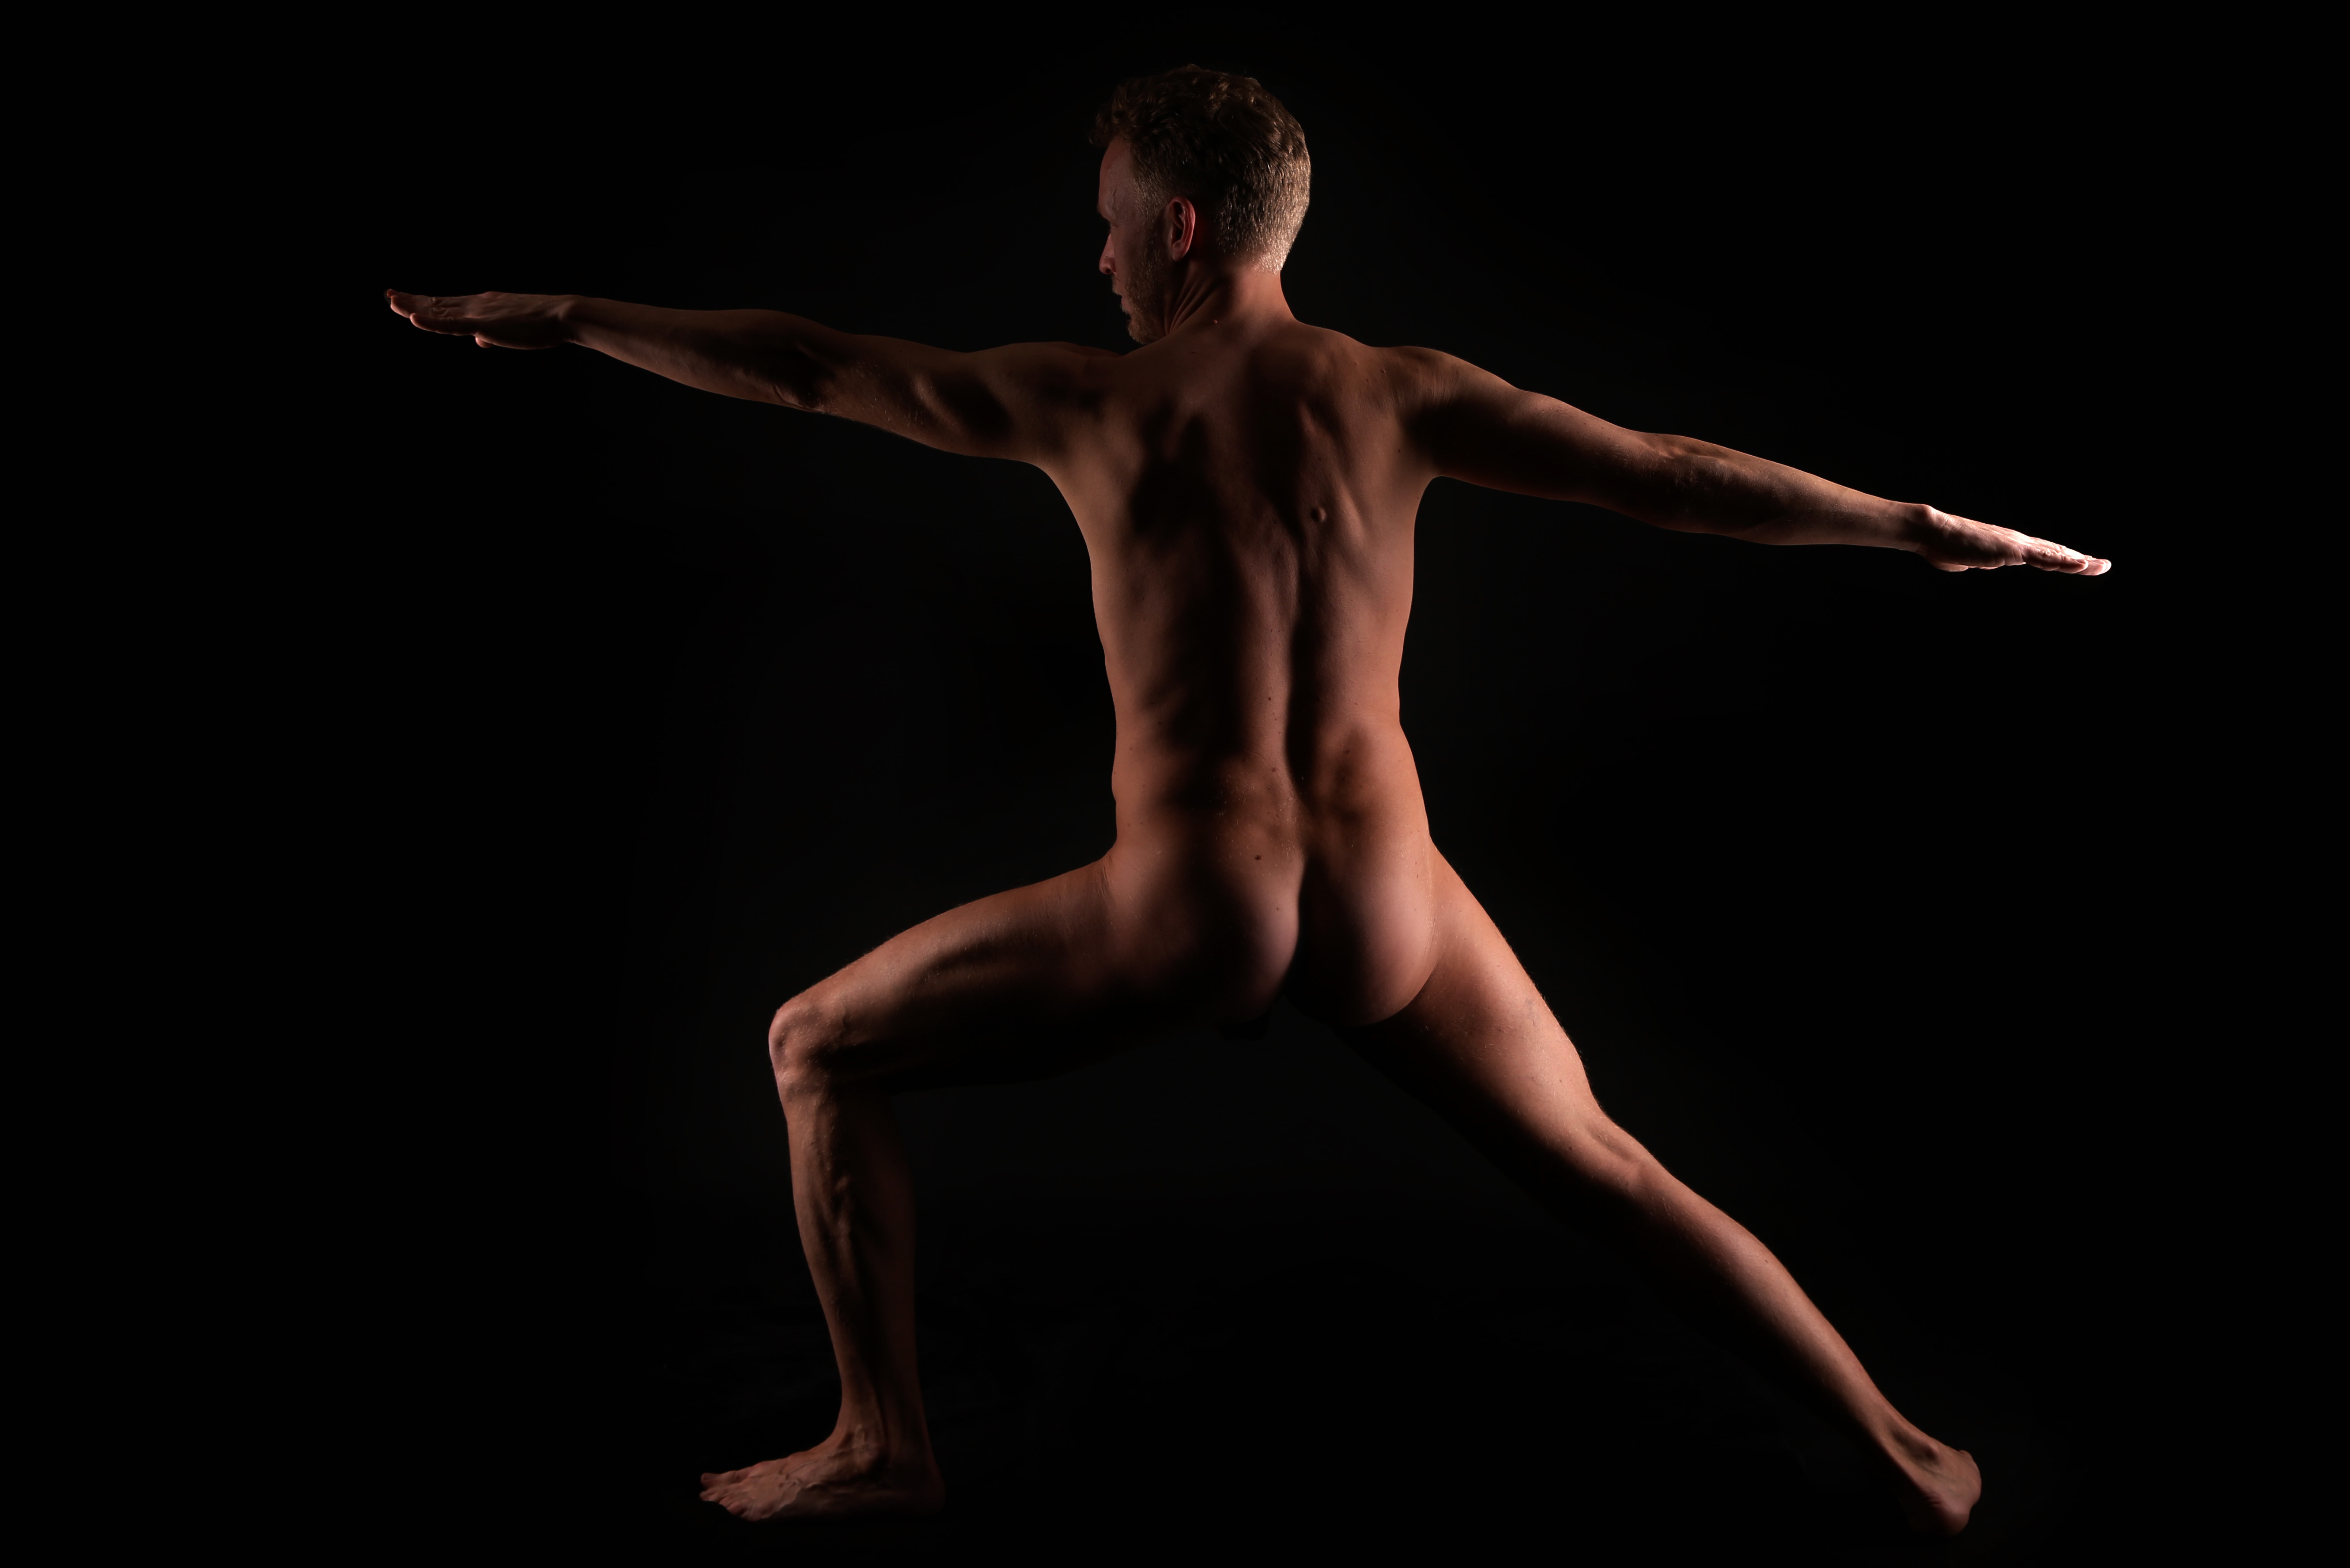 Mann beim Nackt Yoga 1